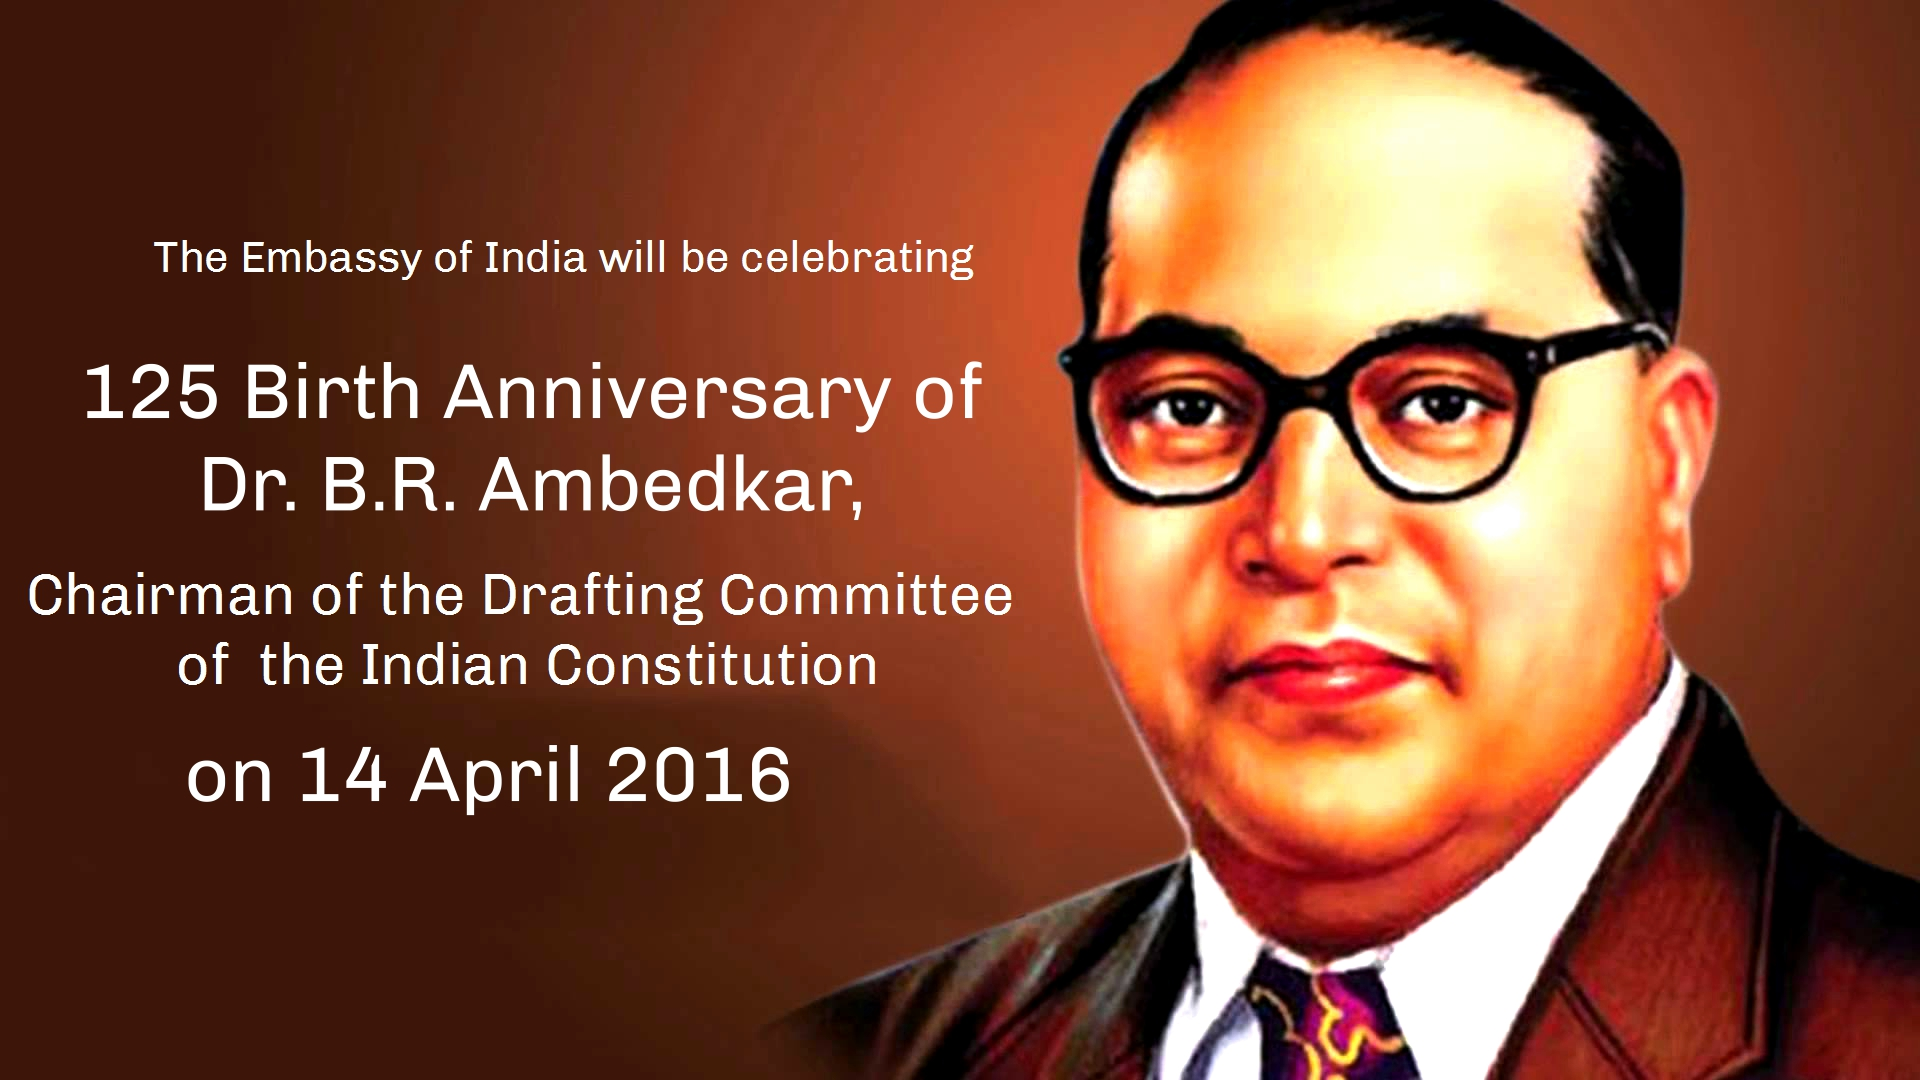 125th Birth Anniversary Of Dr Bhimrao Ambedkar